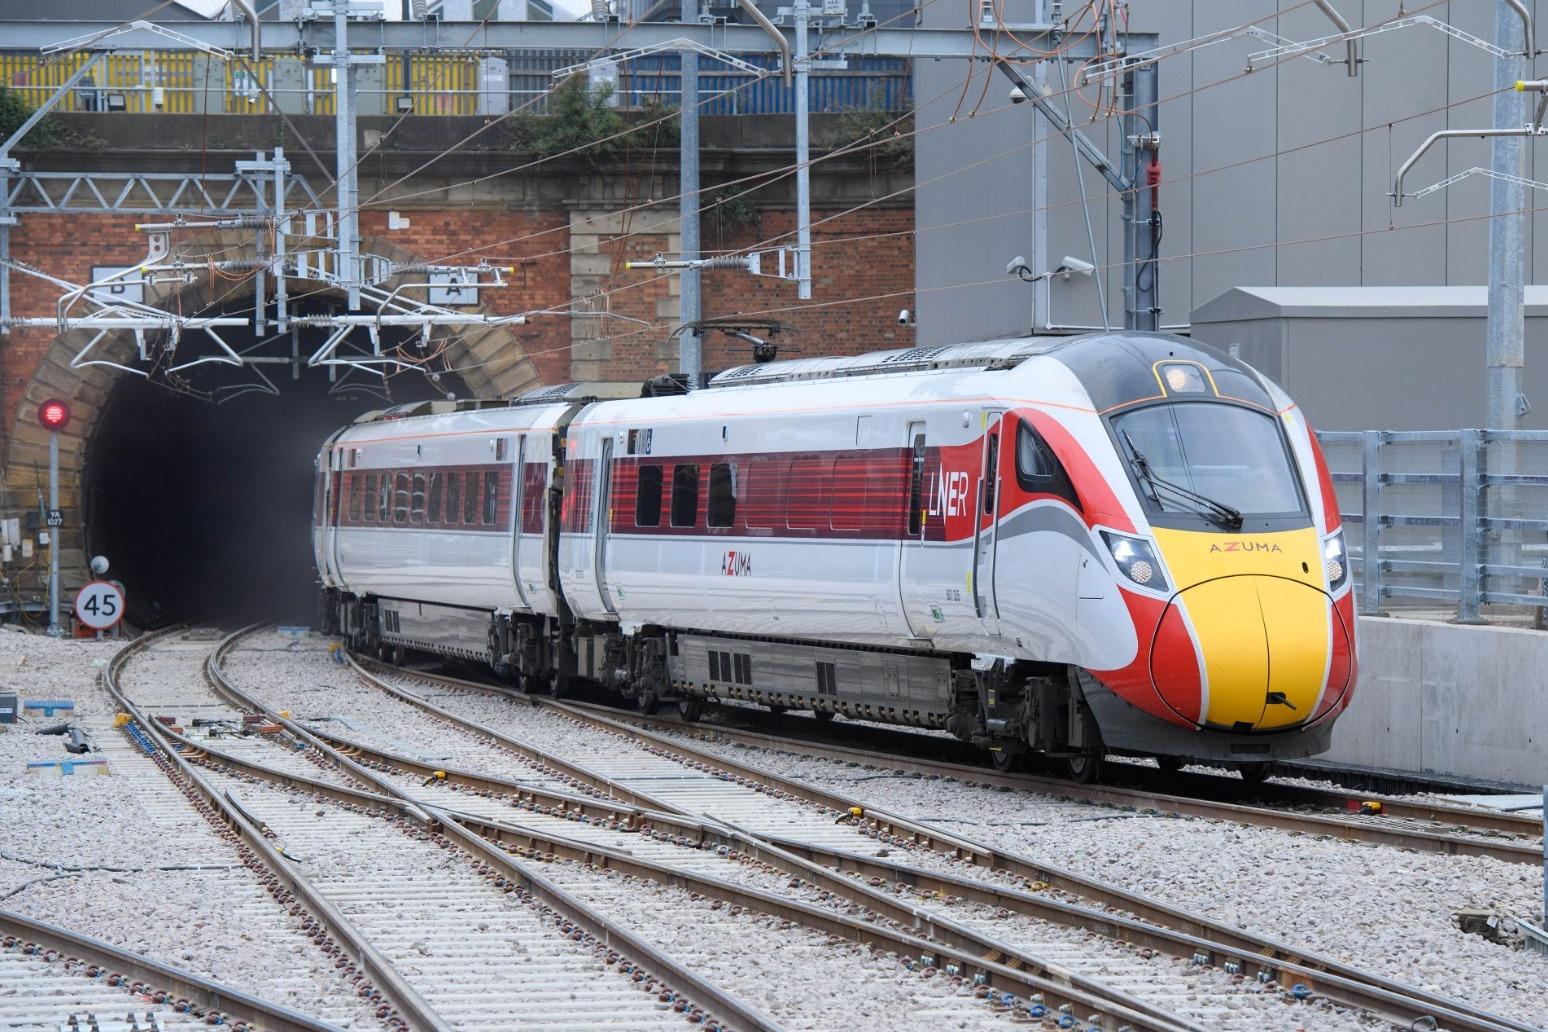 Railway services disrupted as high-speed trains undergo 'precautionary checks'